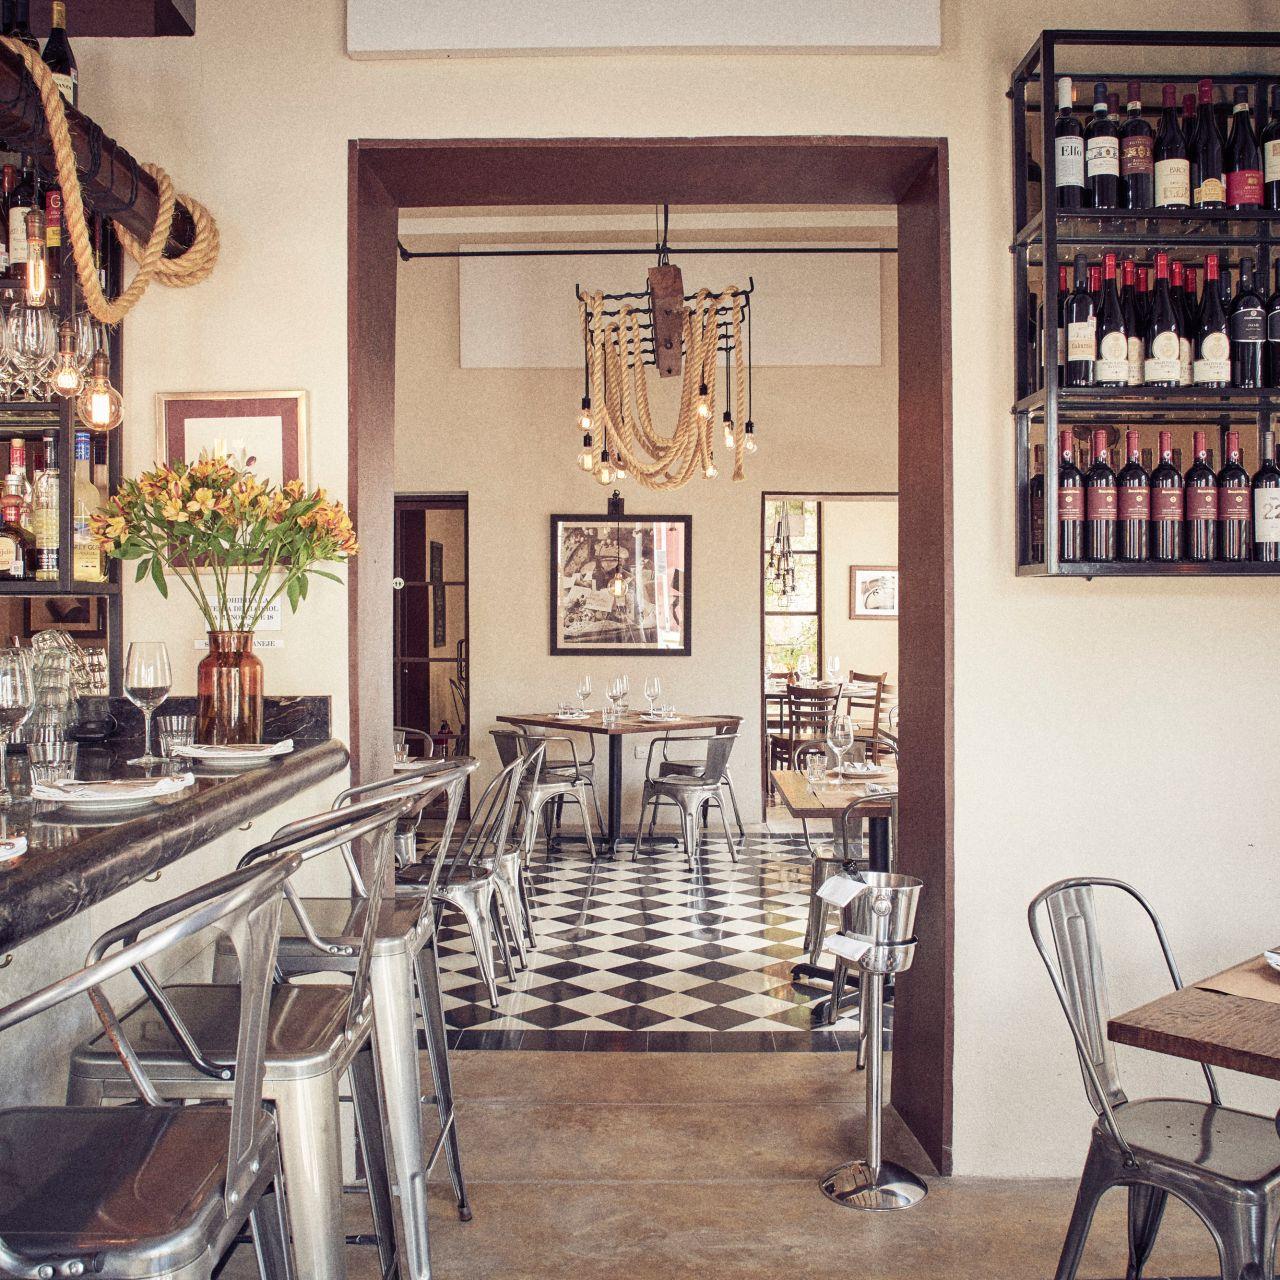 Oliva Enoteca Restaurant   Mérida, YUC   OpenTable